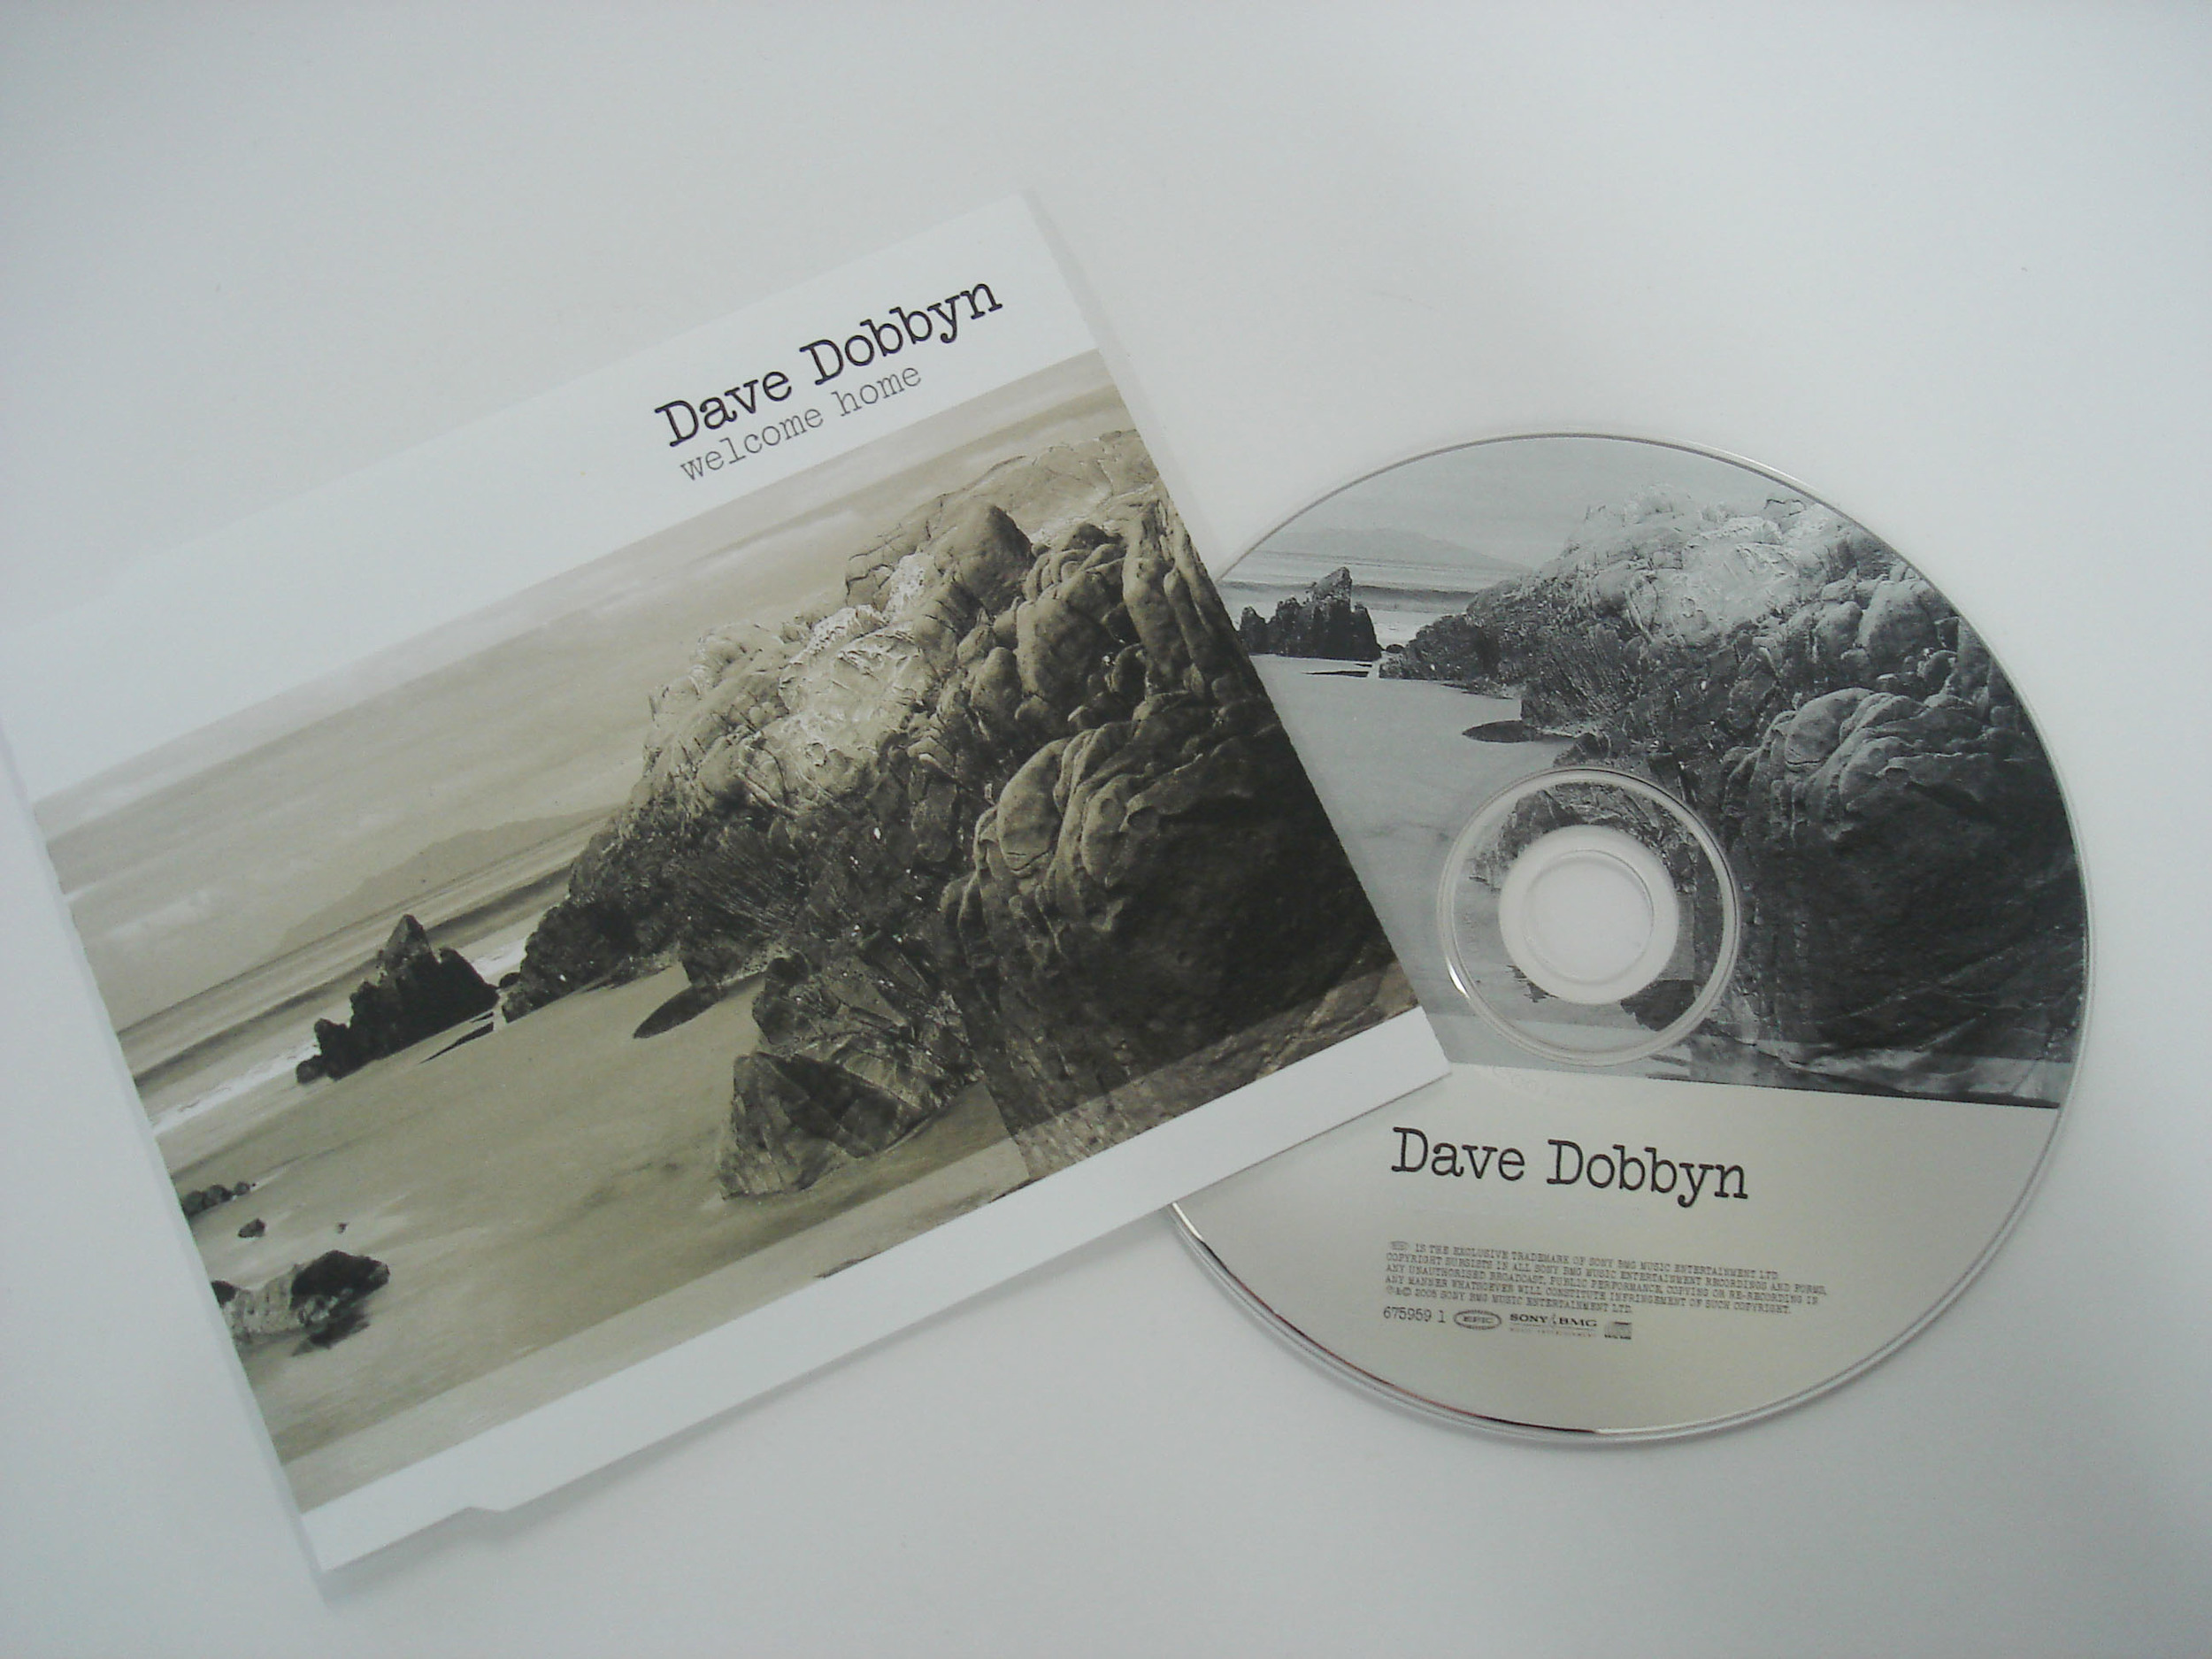 DAVE DOBBYN - WELCOME HOME - SINGLE